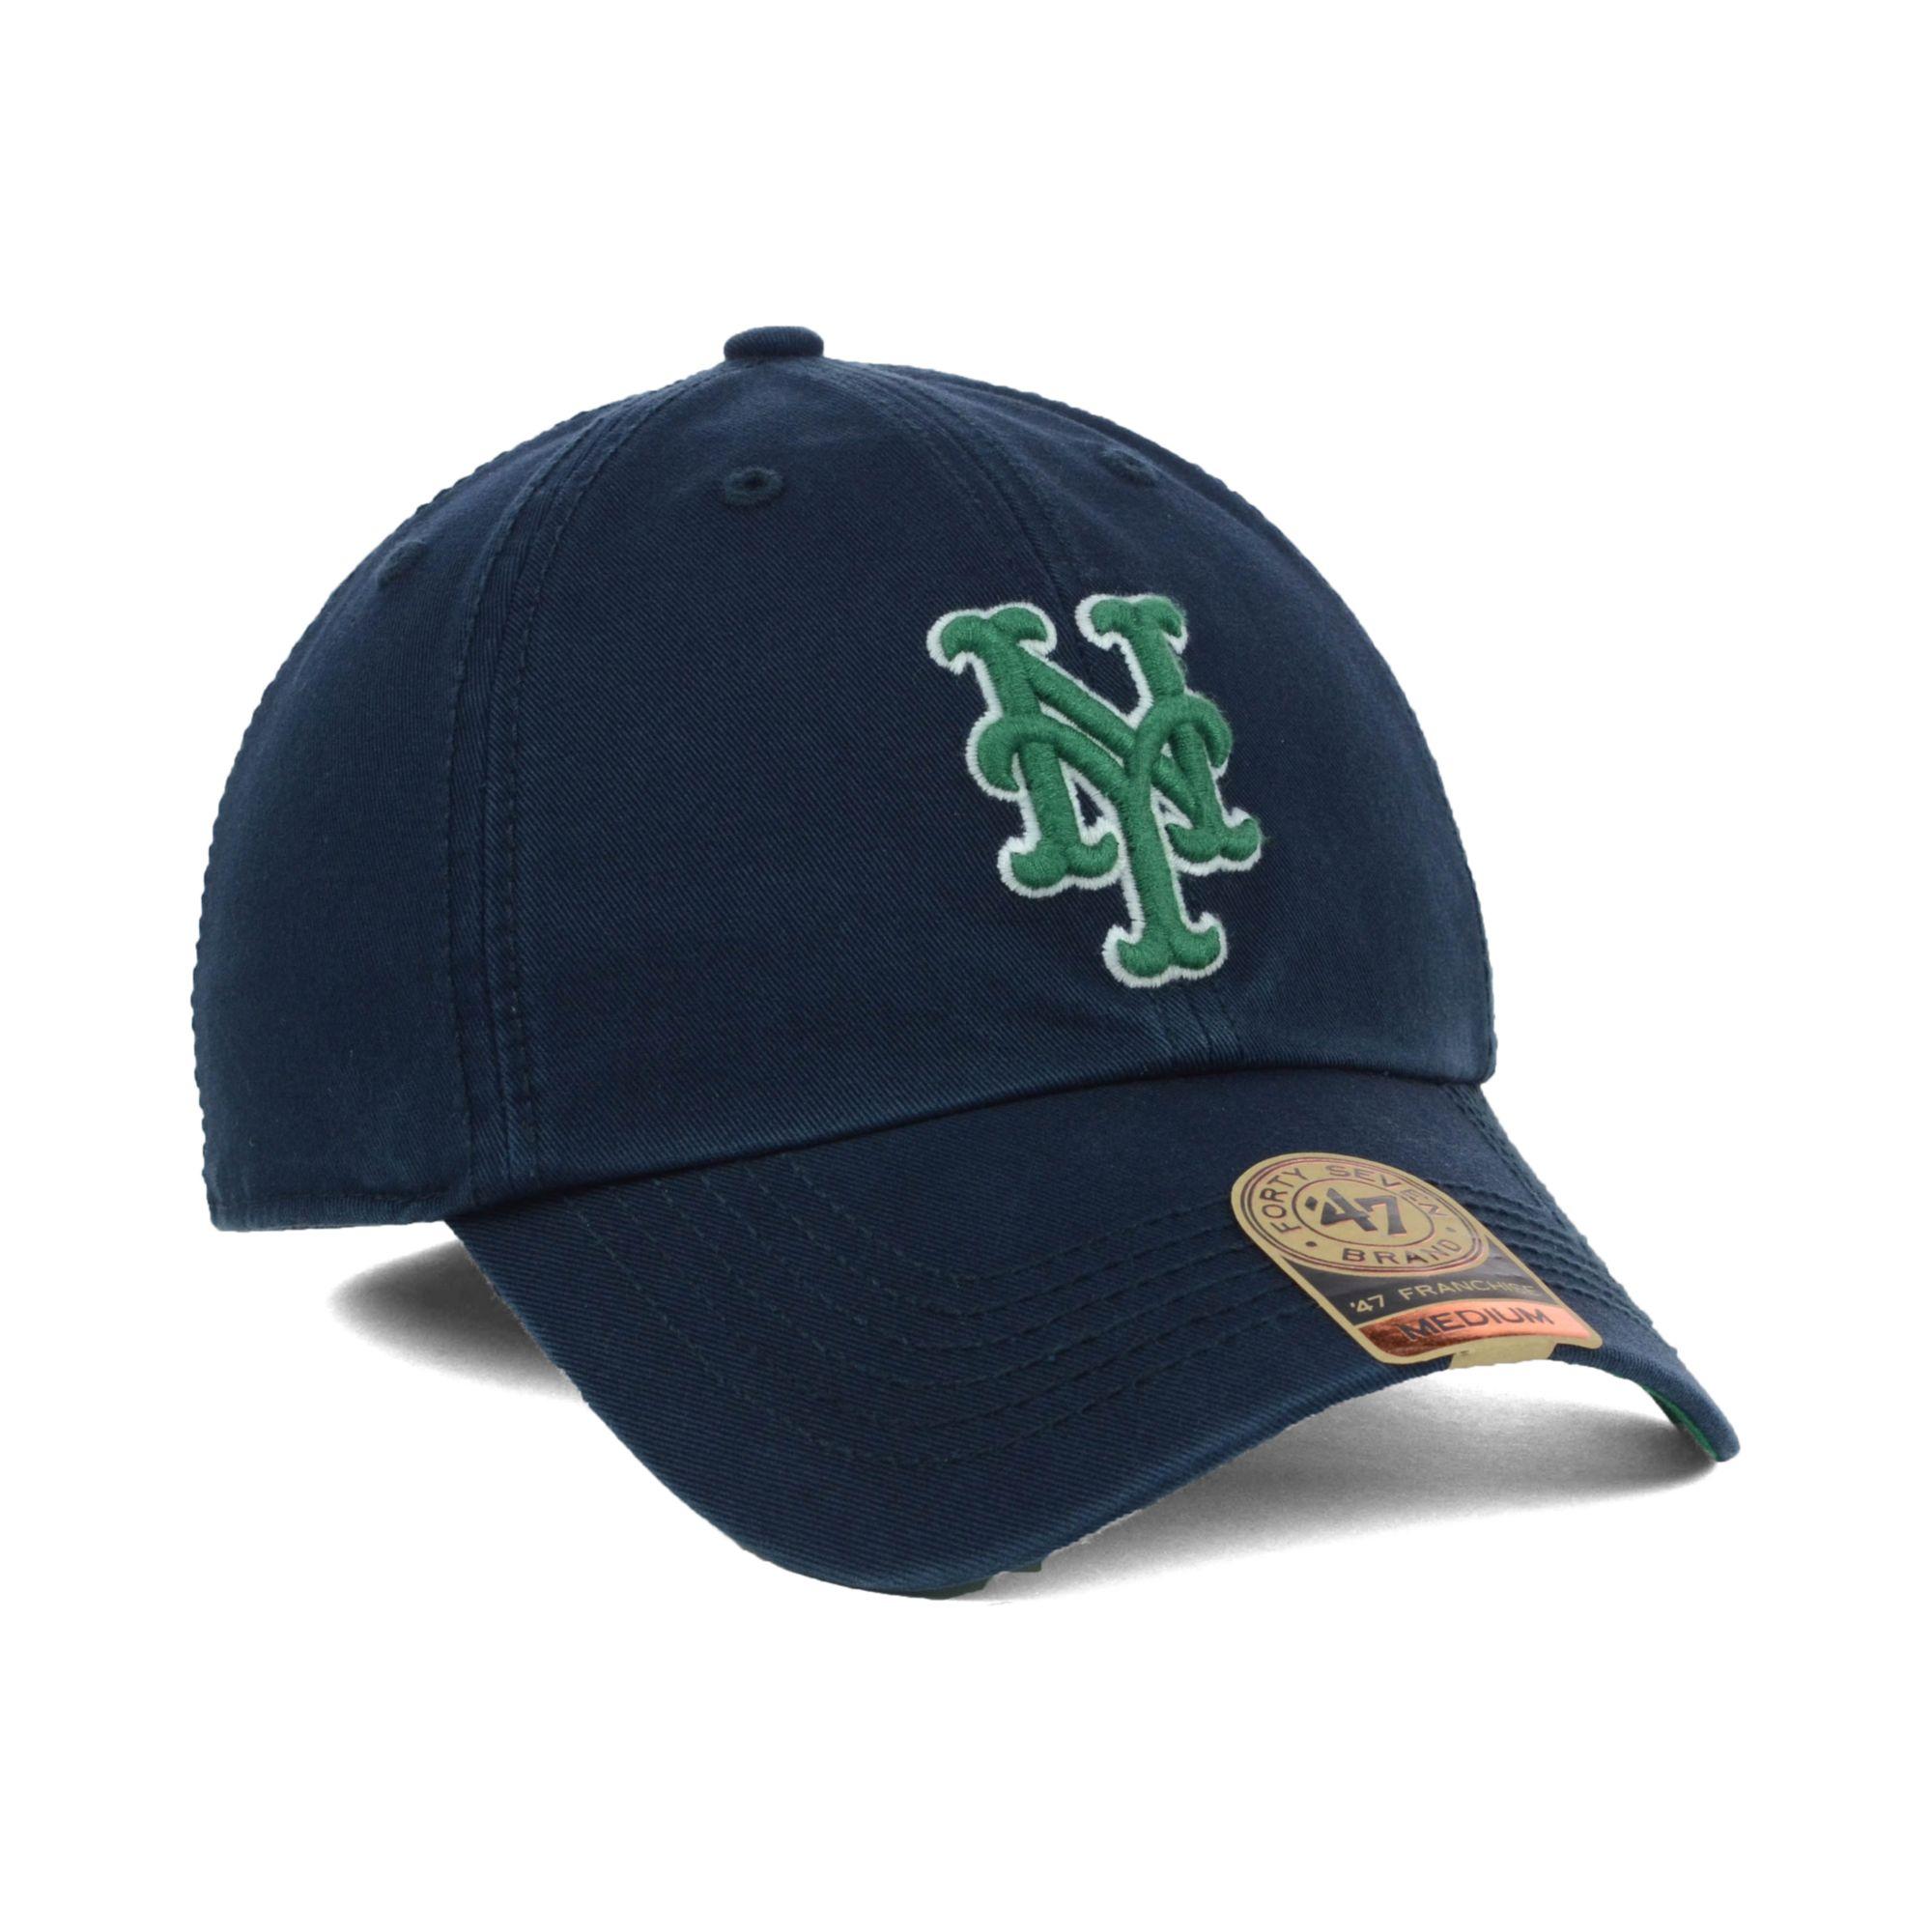 reduced new york yankees fitted hats cheap venues bdb3a 4b4c7  buy new york  mets trucker hat hat fb591 74045 b2f80b67926c